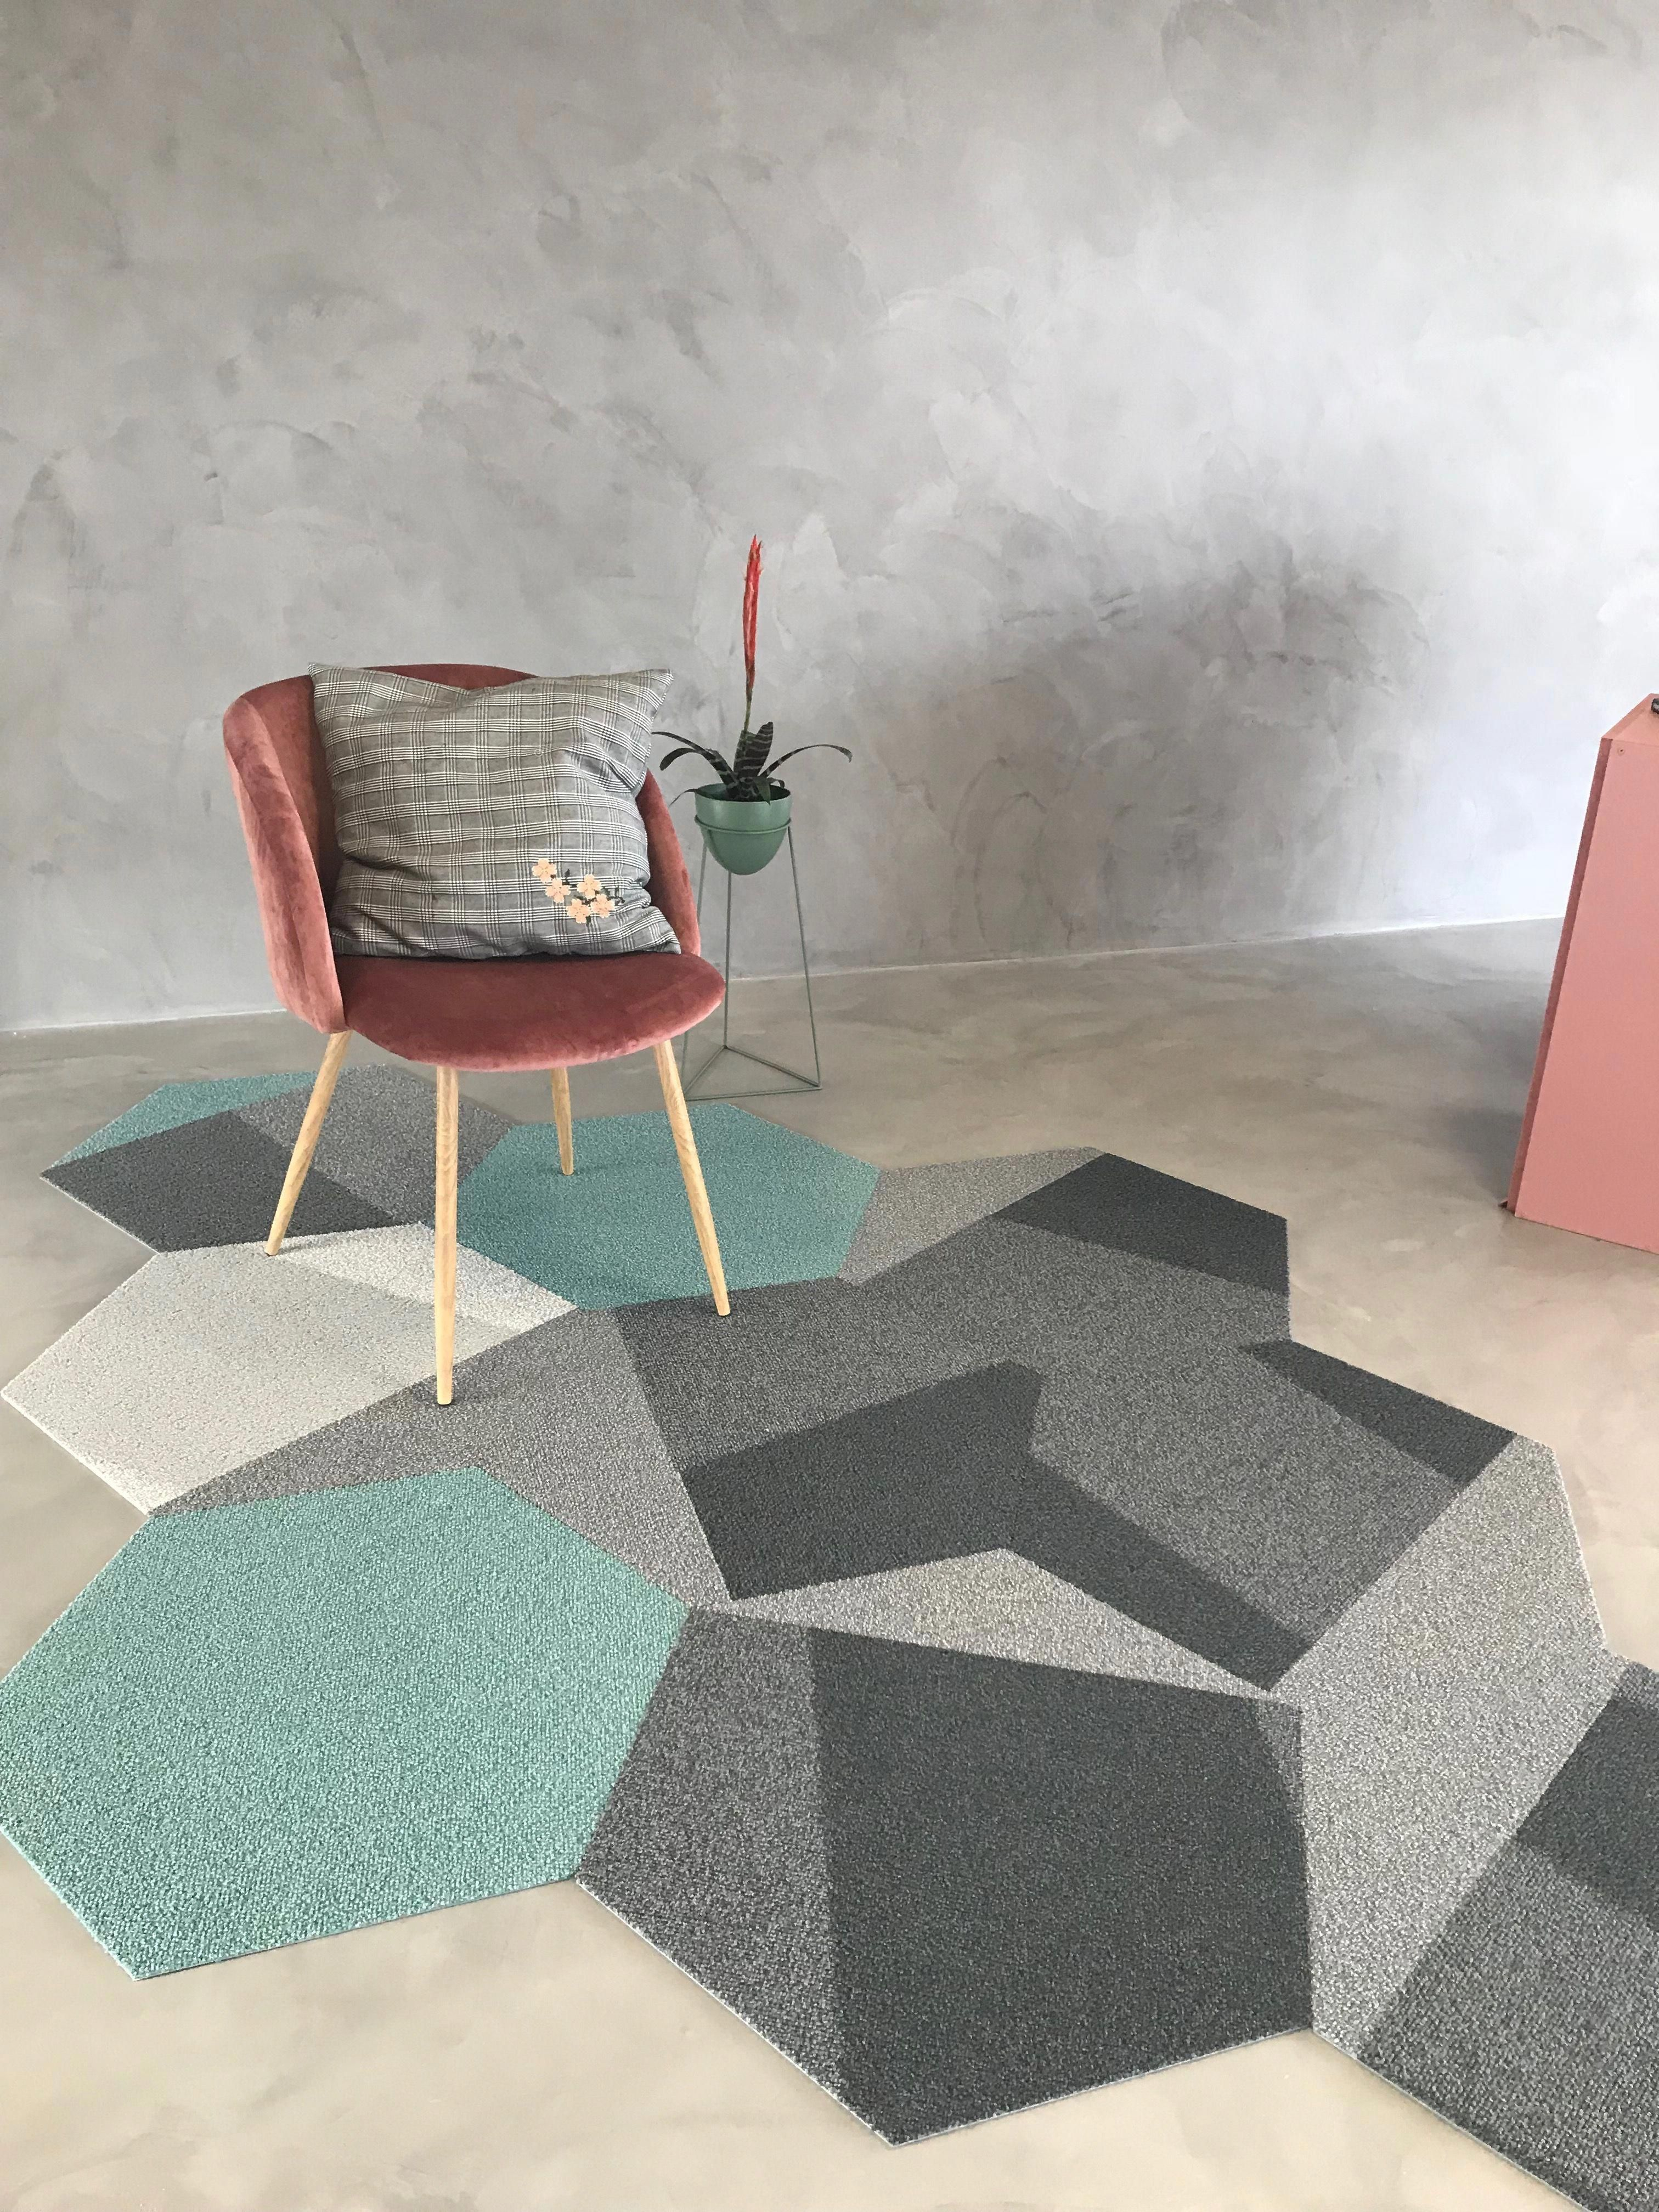 Carpets And Flooring Near Me CarpetRunnersCutToSize Code